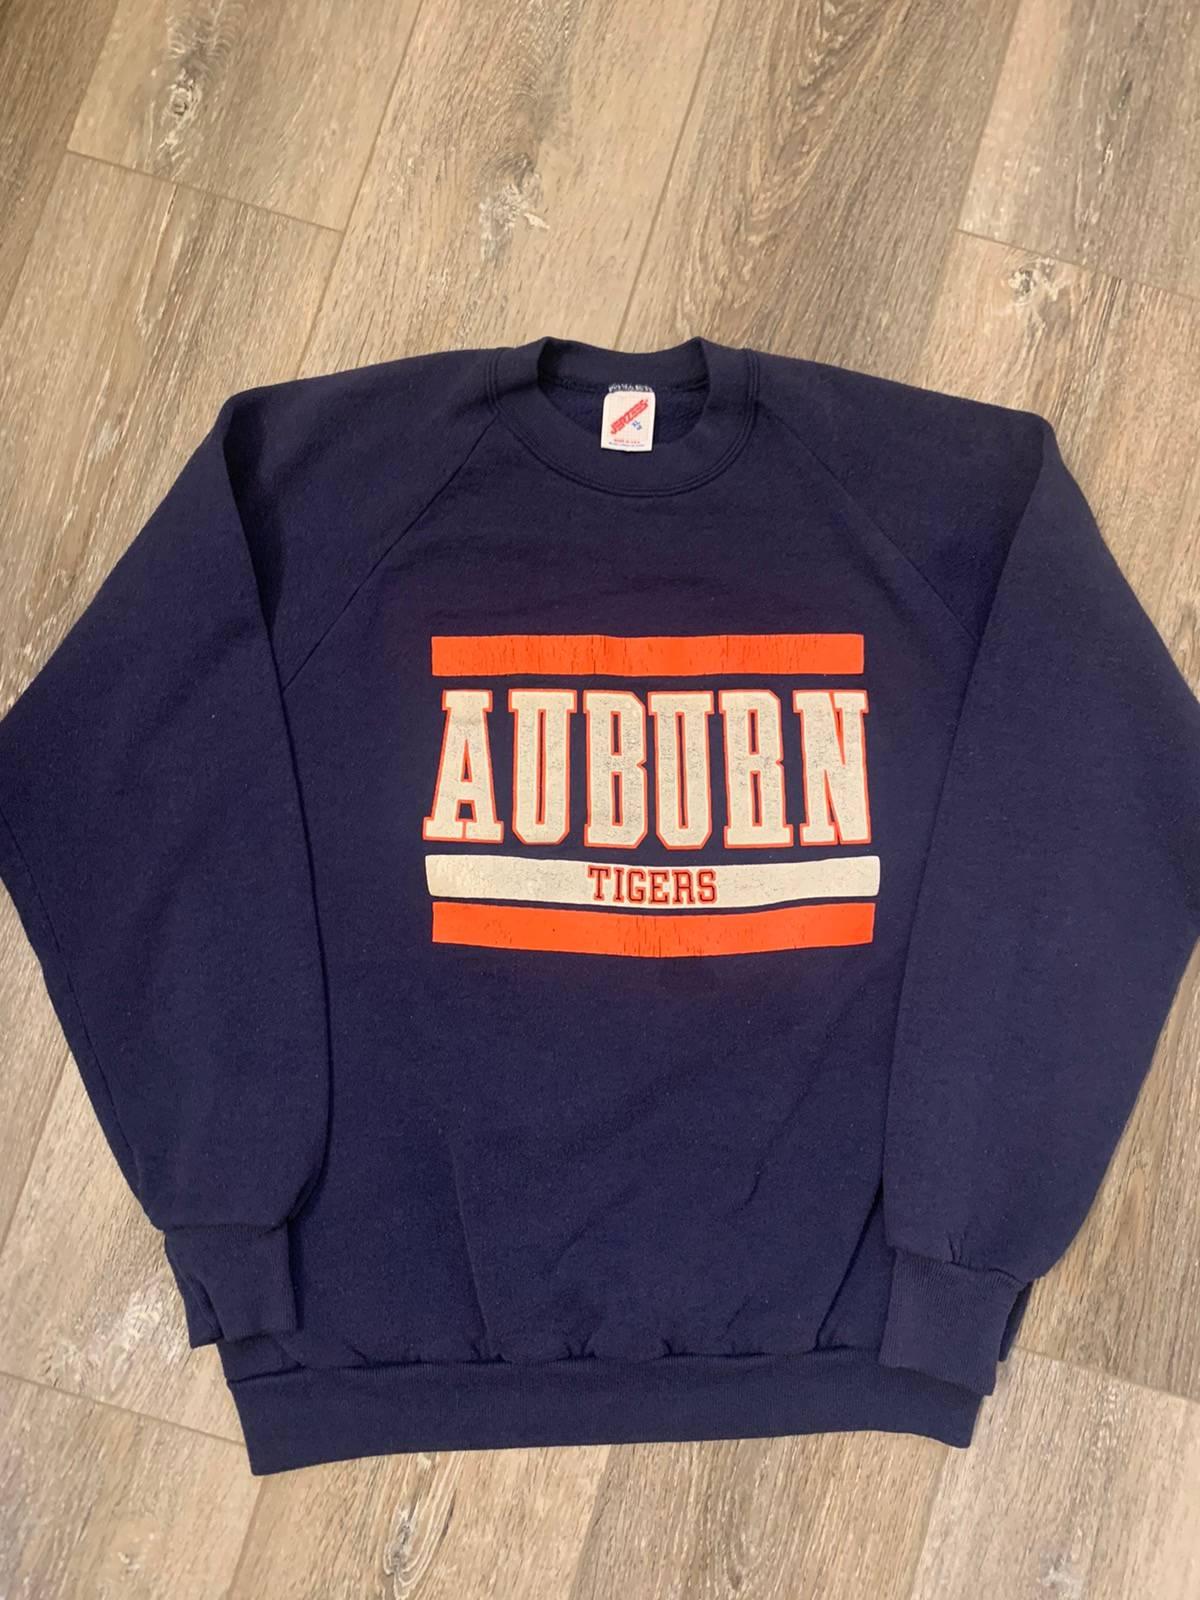 Vintage Auburn University Cropped Zip-up Tee XL